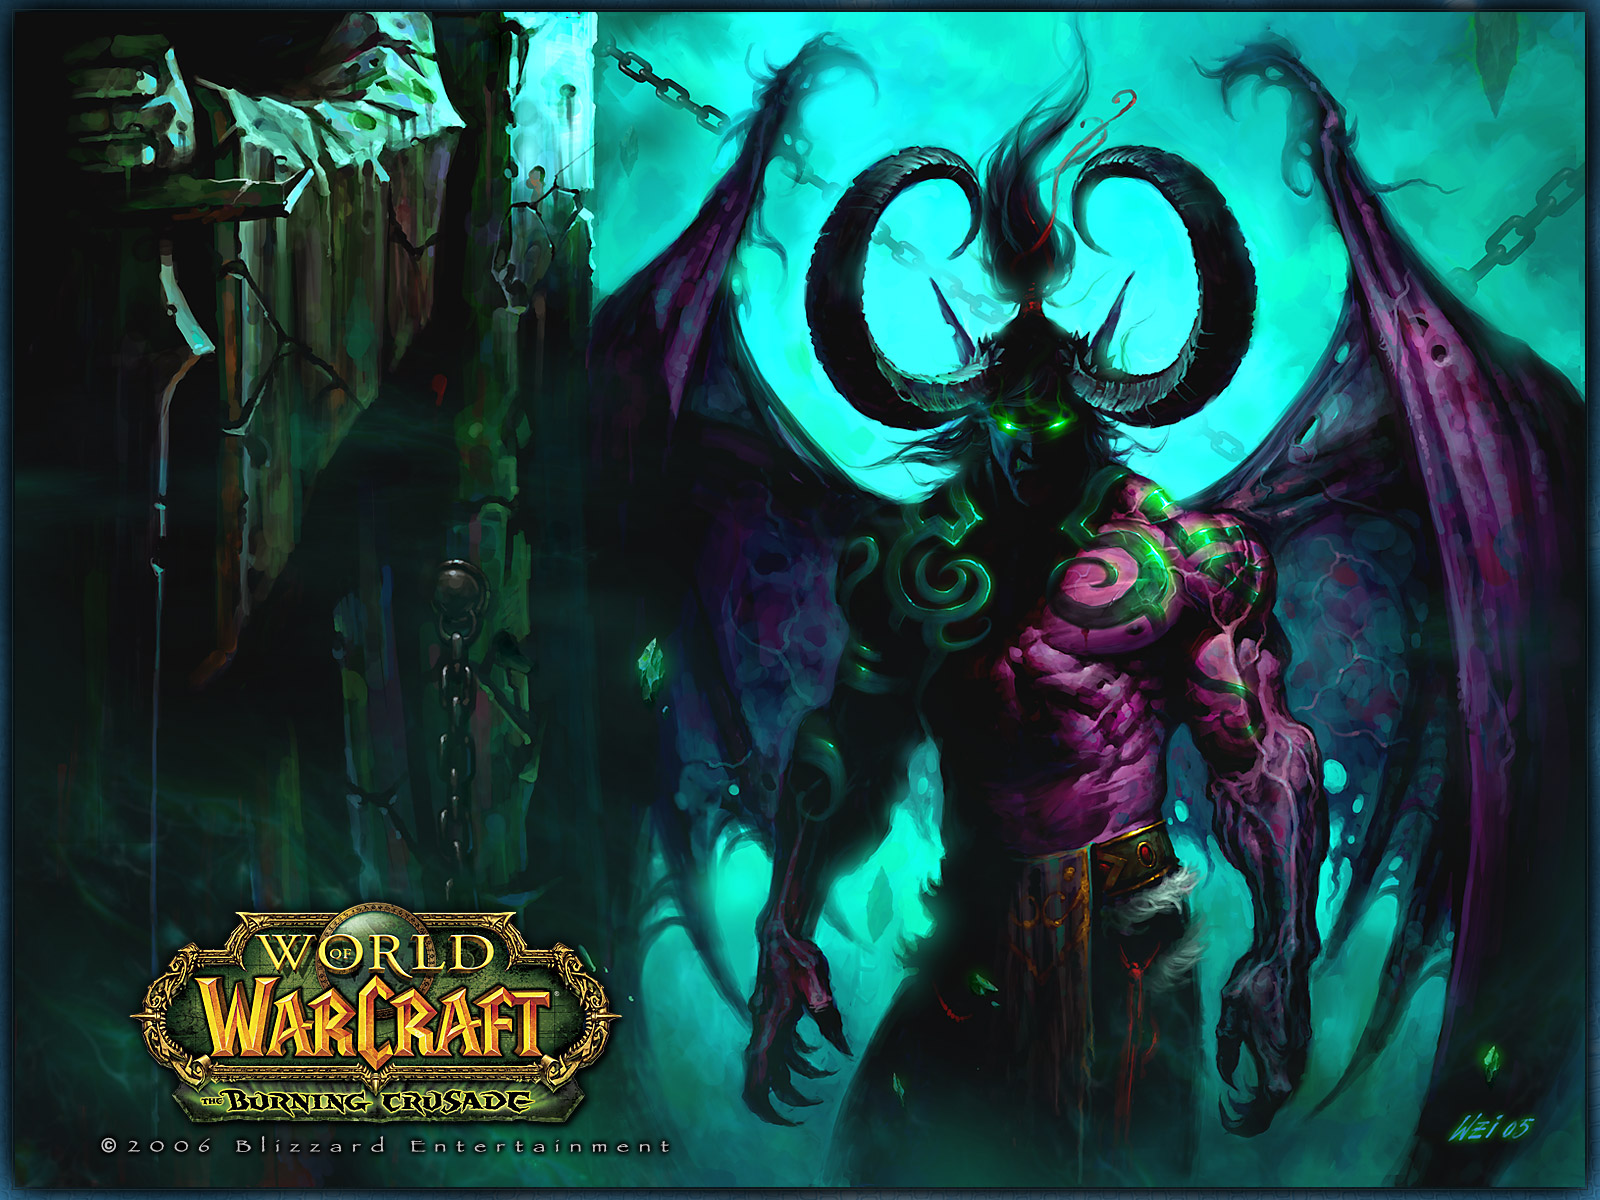 World of warcraft achtergronden world of warcraft wallpapers wow 1600x1200